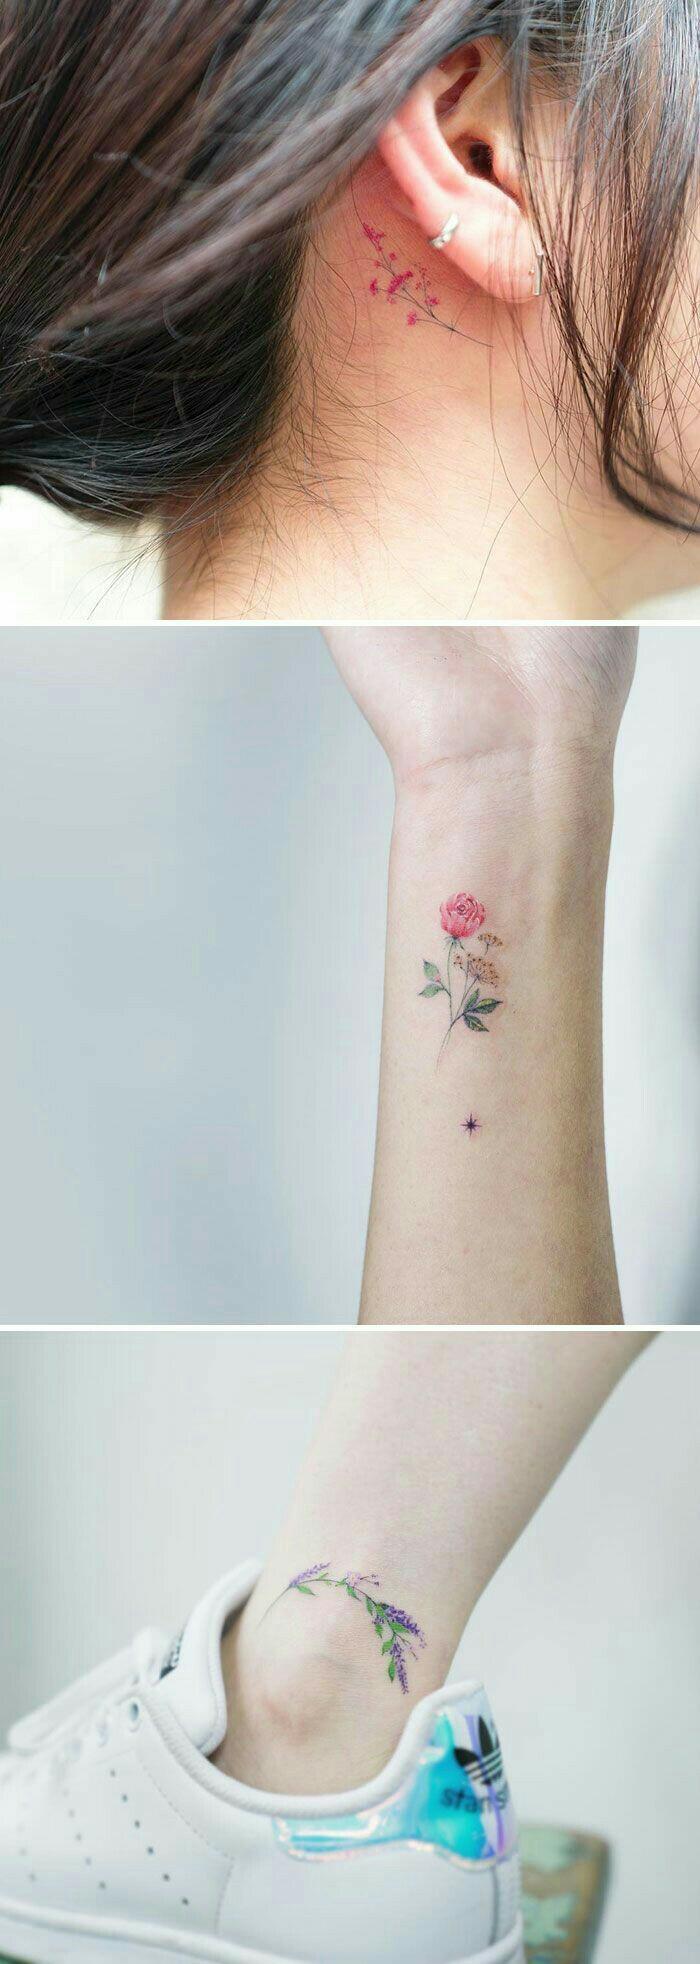 The ankle tattoo placement.  SHOP: www.seayogi.es  IG: @Seayogipalma   Ropa para Yoga  —  Yoga apparel & Gear